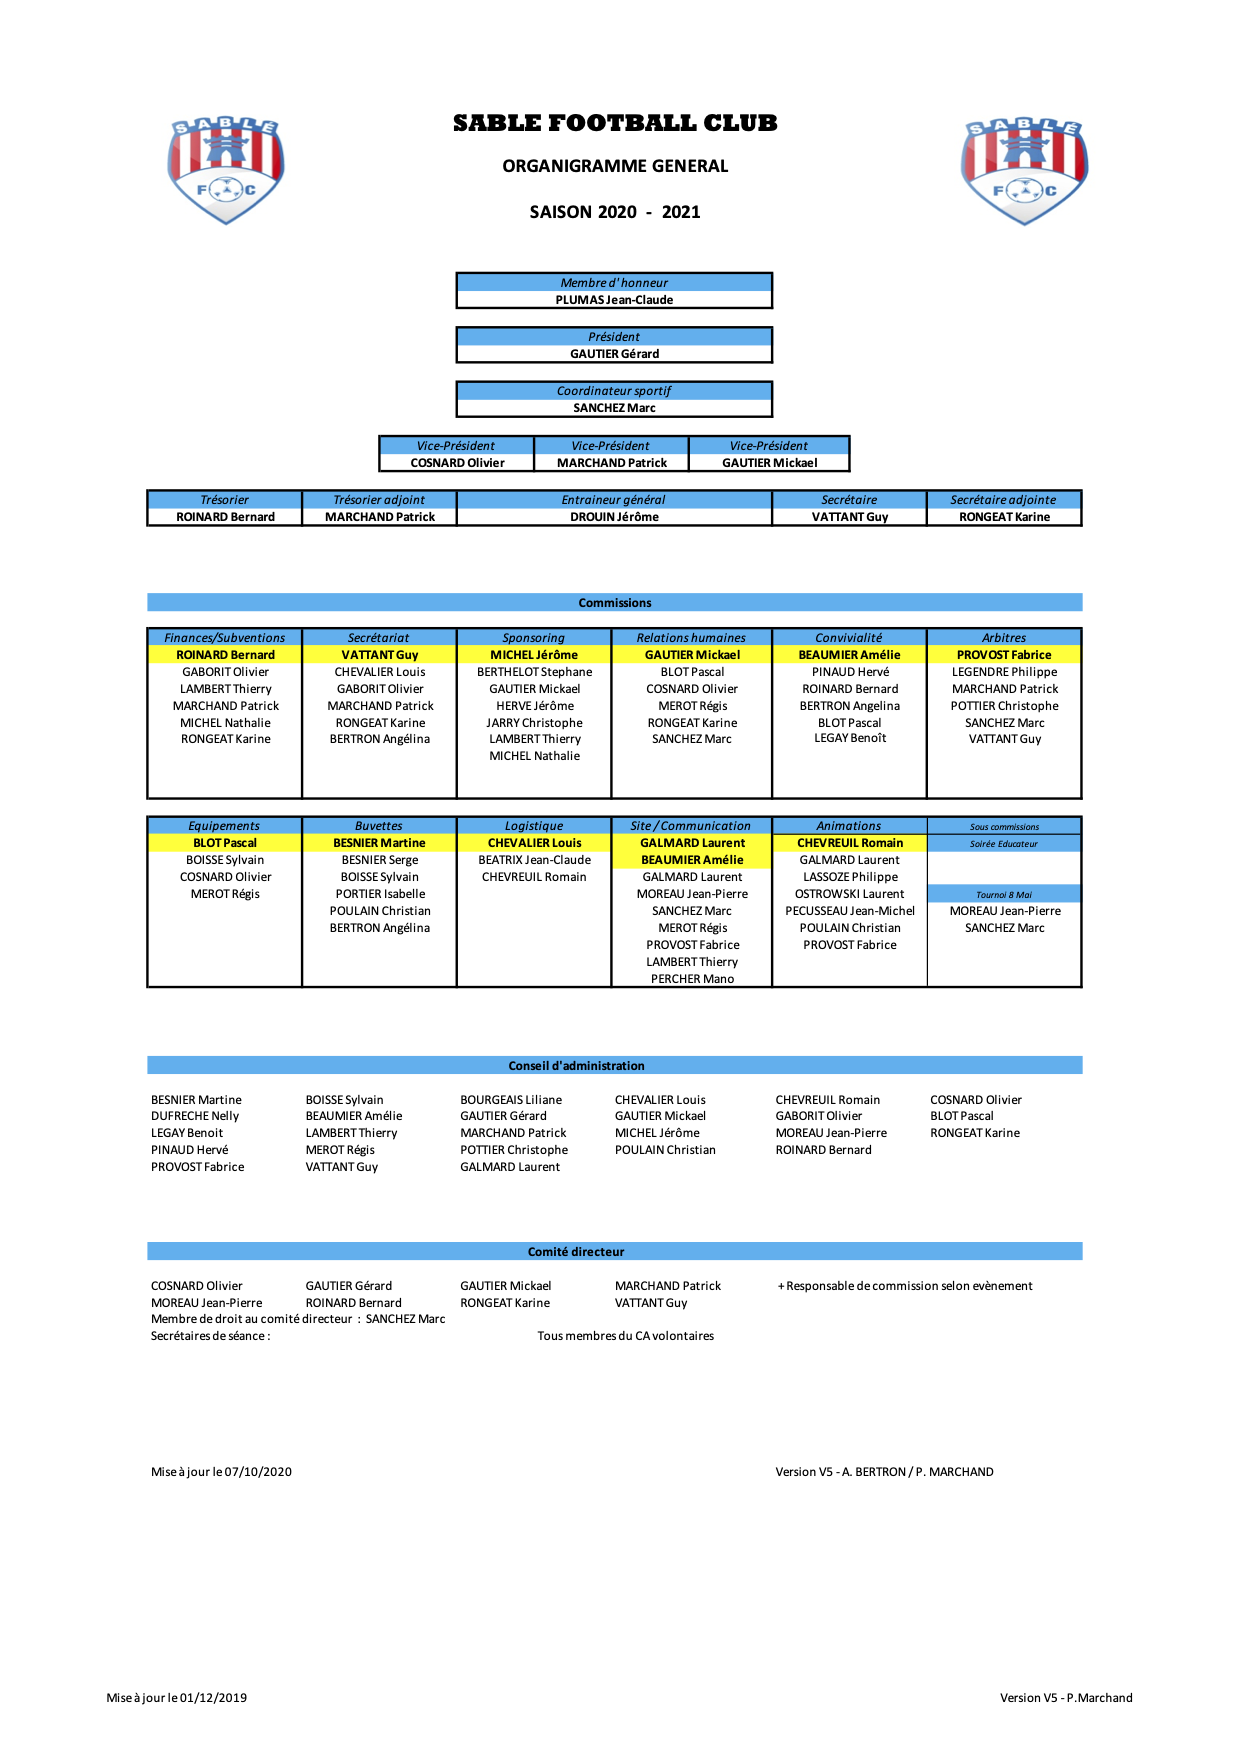 Organigramme administratif 2020 - 2021 version 5.png